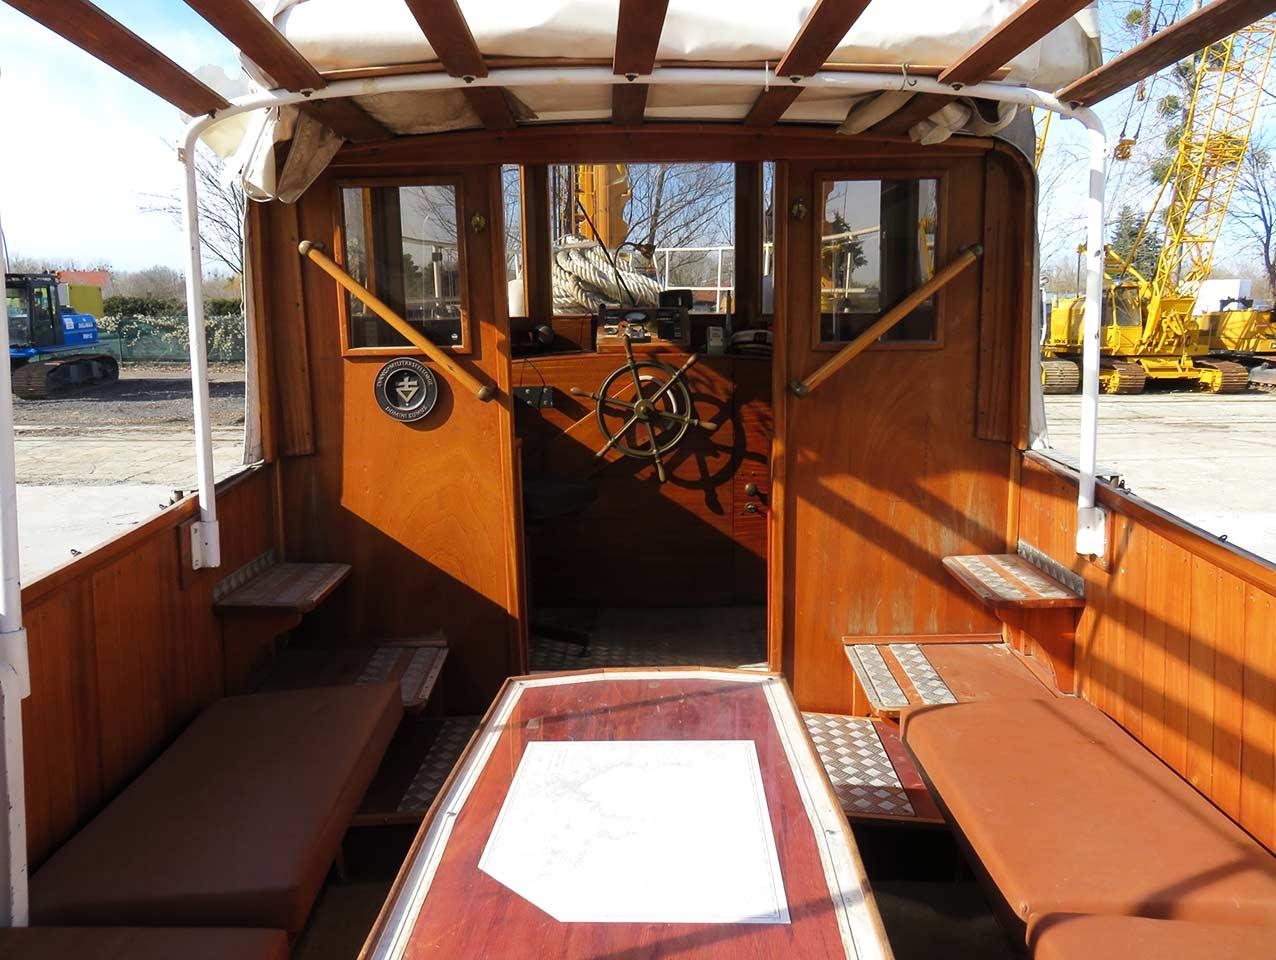 fassmer_shipyard_wood_ship_view_of_the_cabin